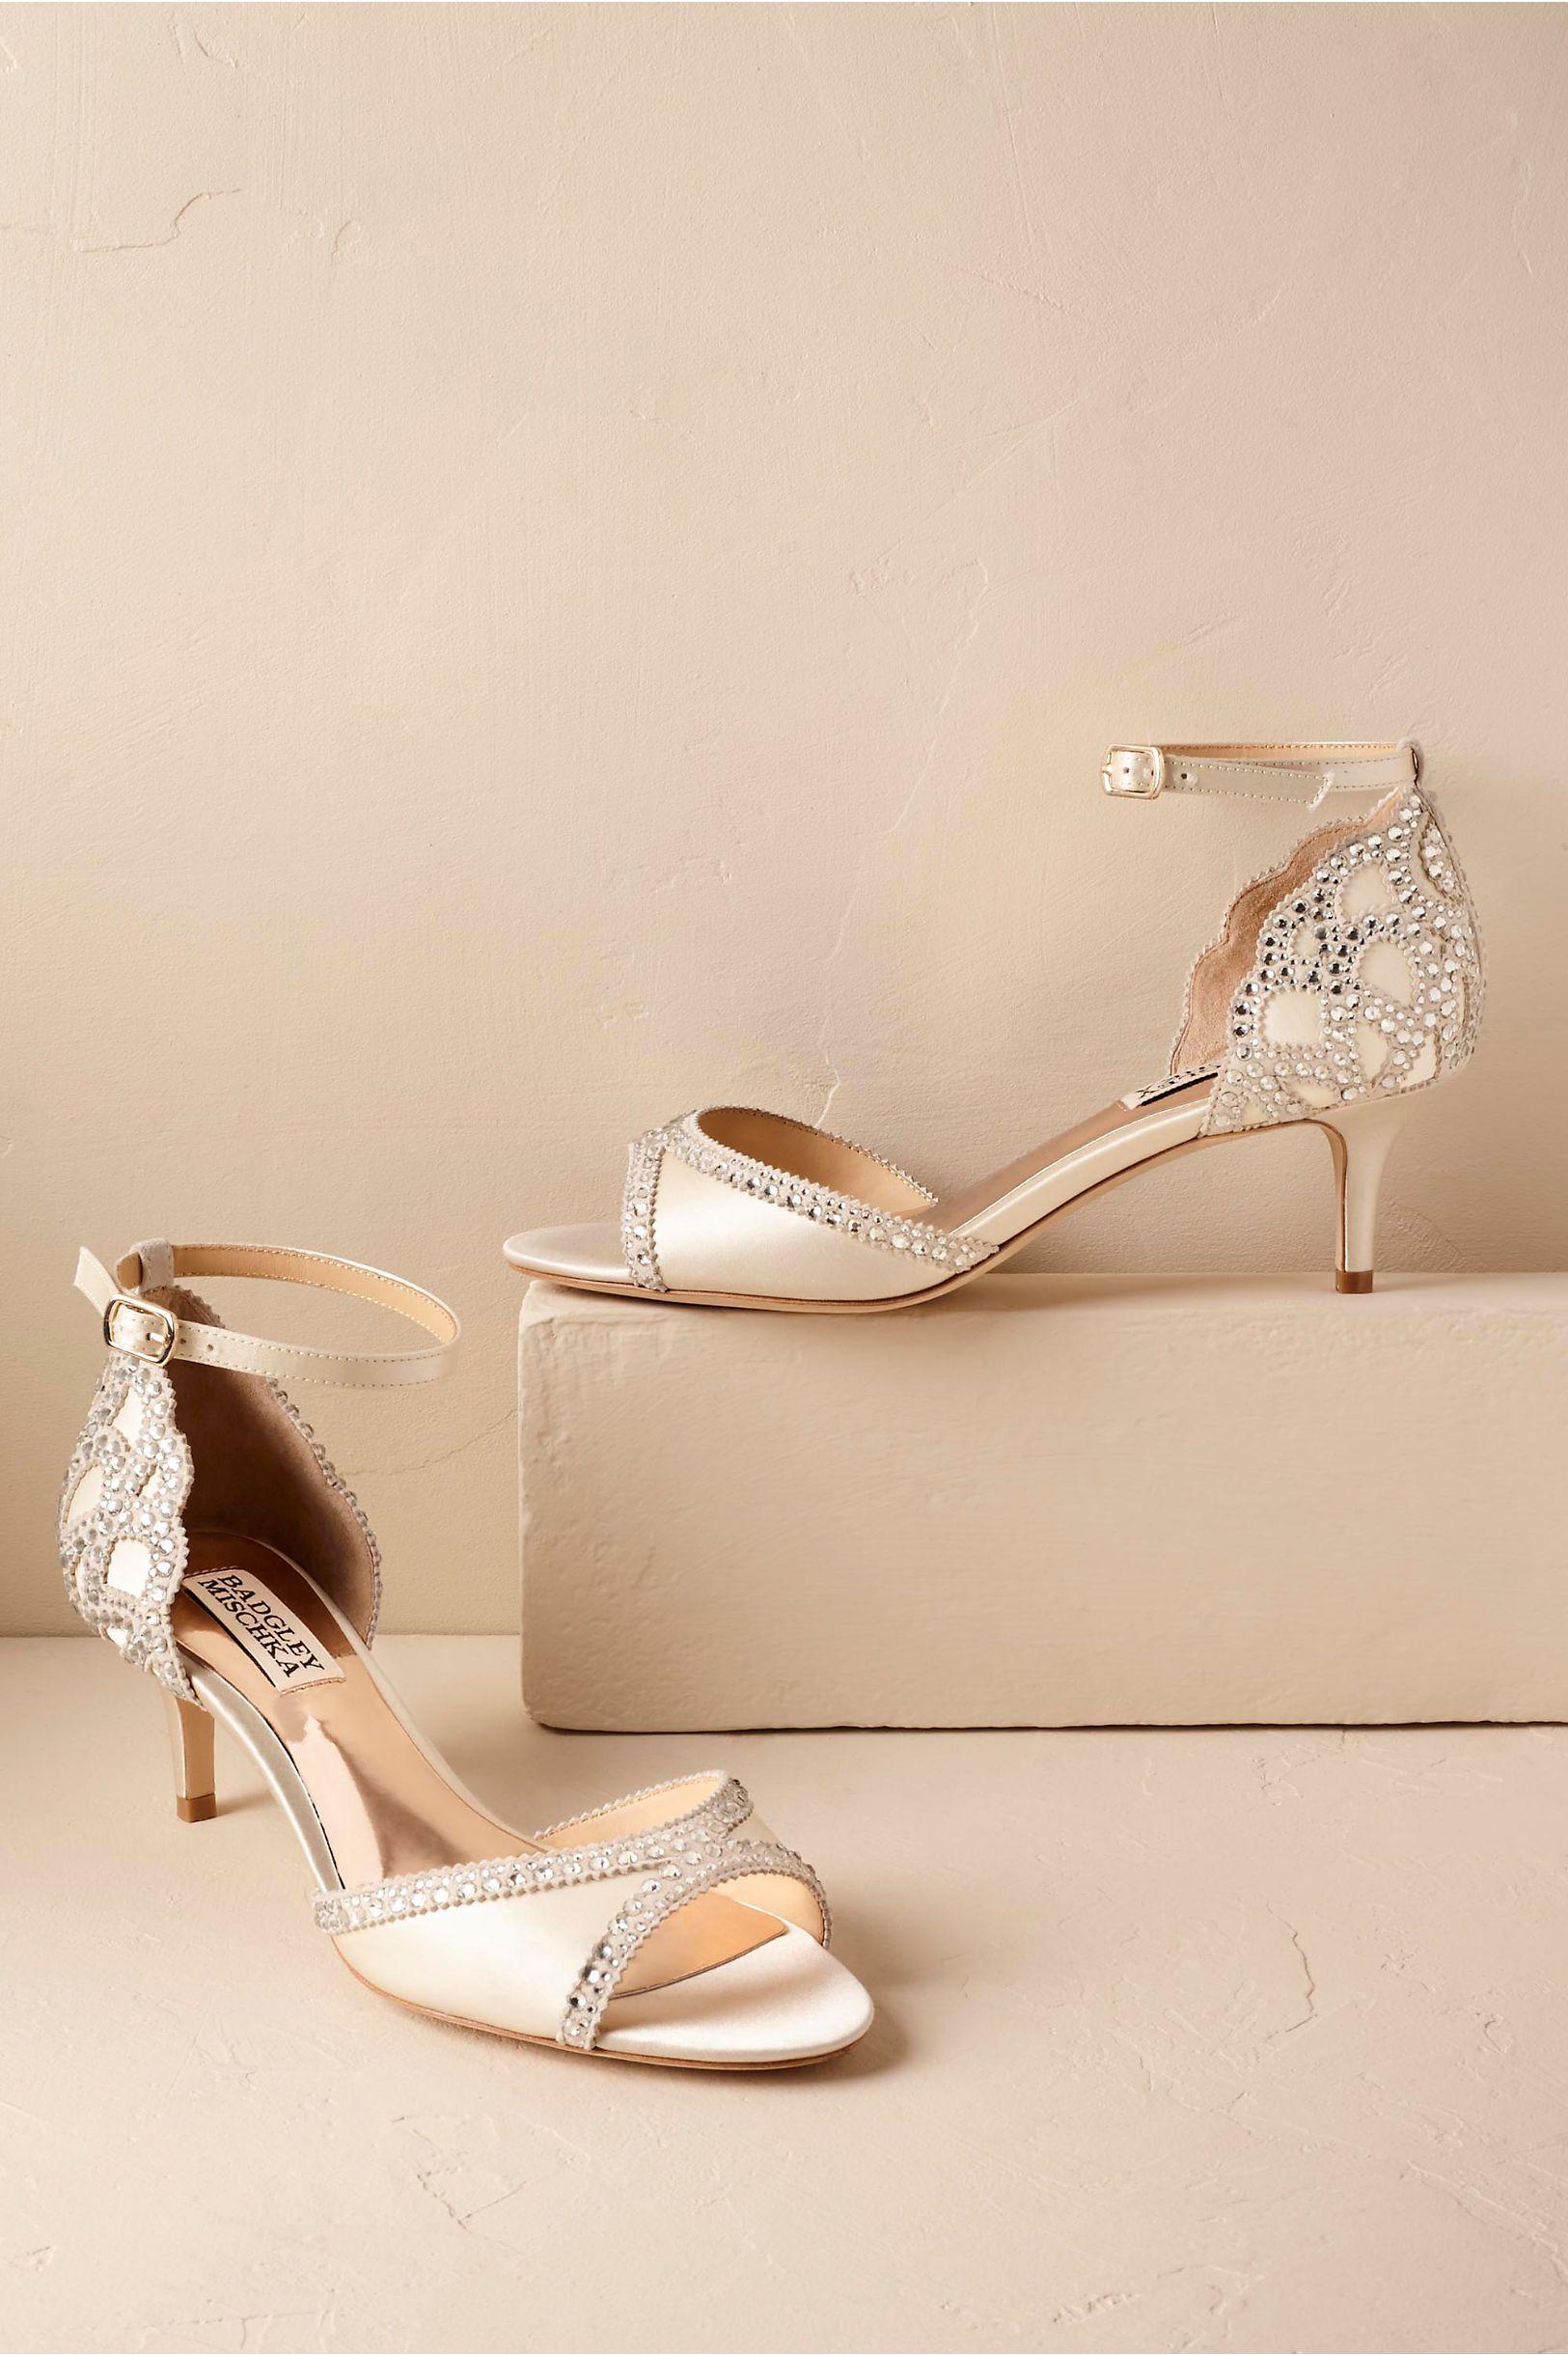 Bhldn S Badgley Mischka Chaumont Heels In Ivory Bridal Shoes Low Heel Wedding Shoes Vintage Wedding Shoes Low Heel